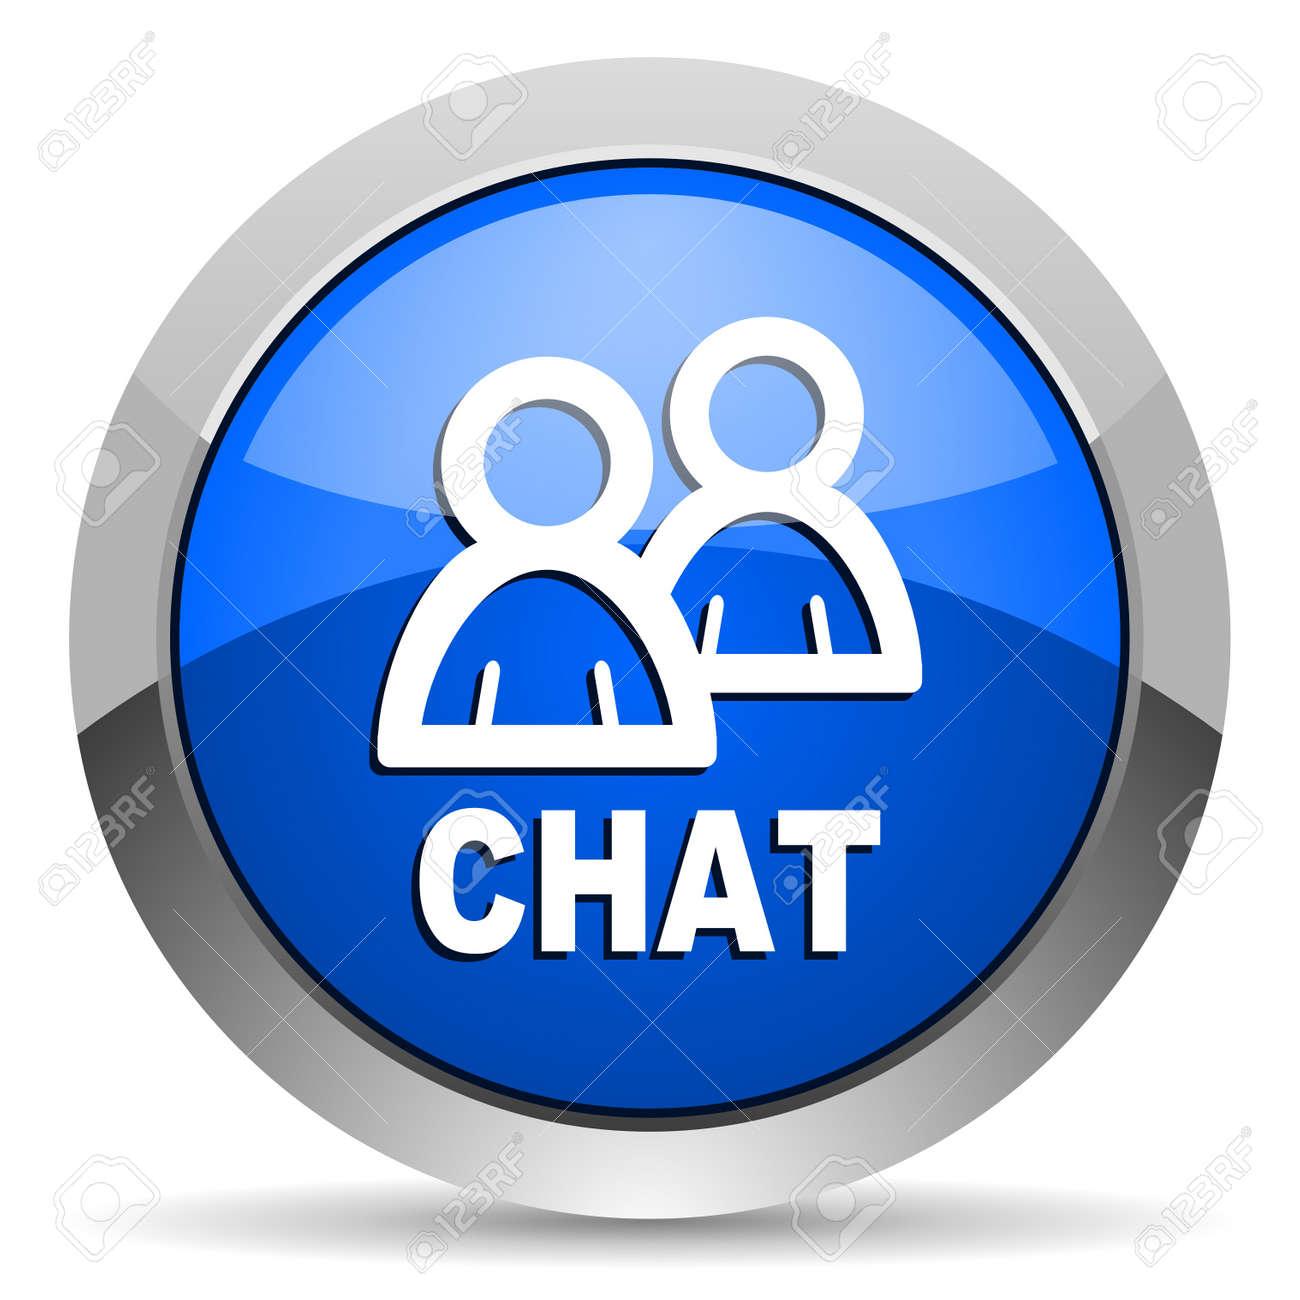 chat icon Stock Photo - 16225813